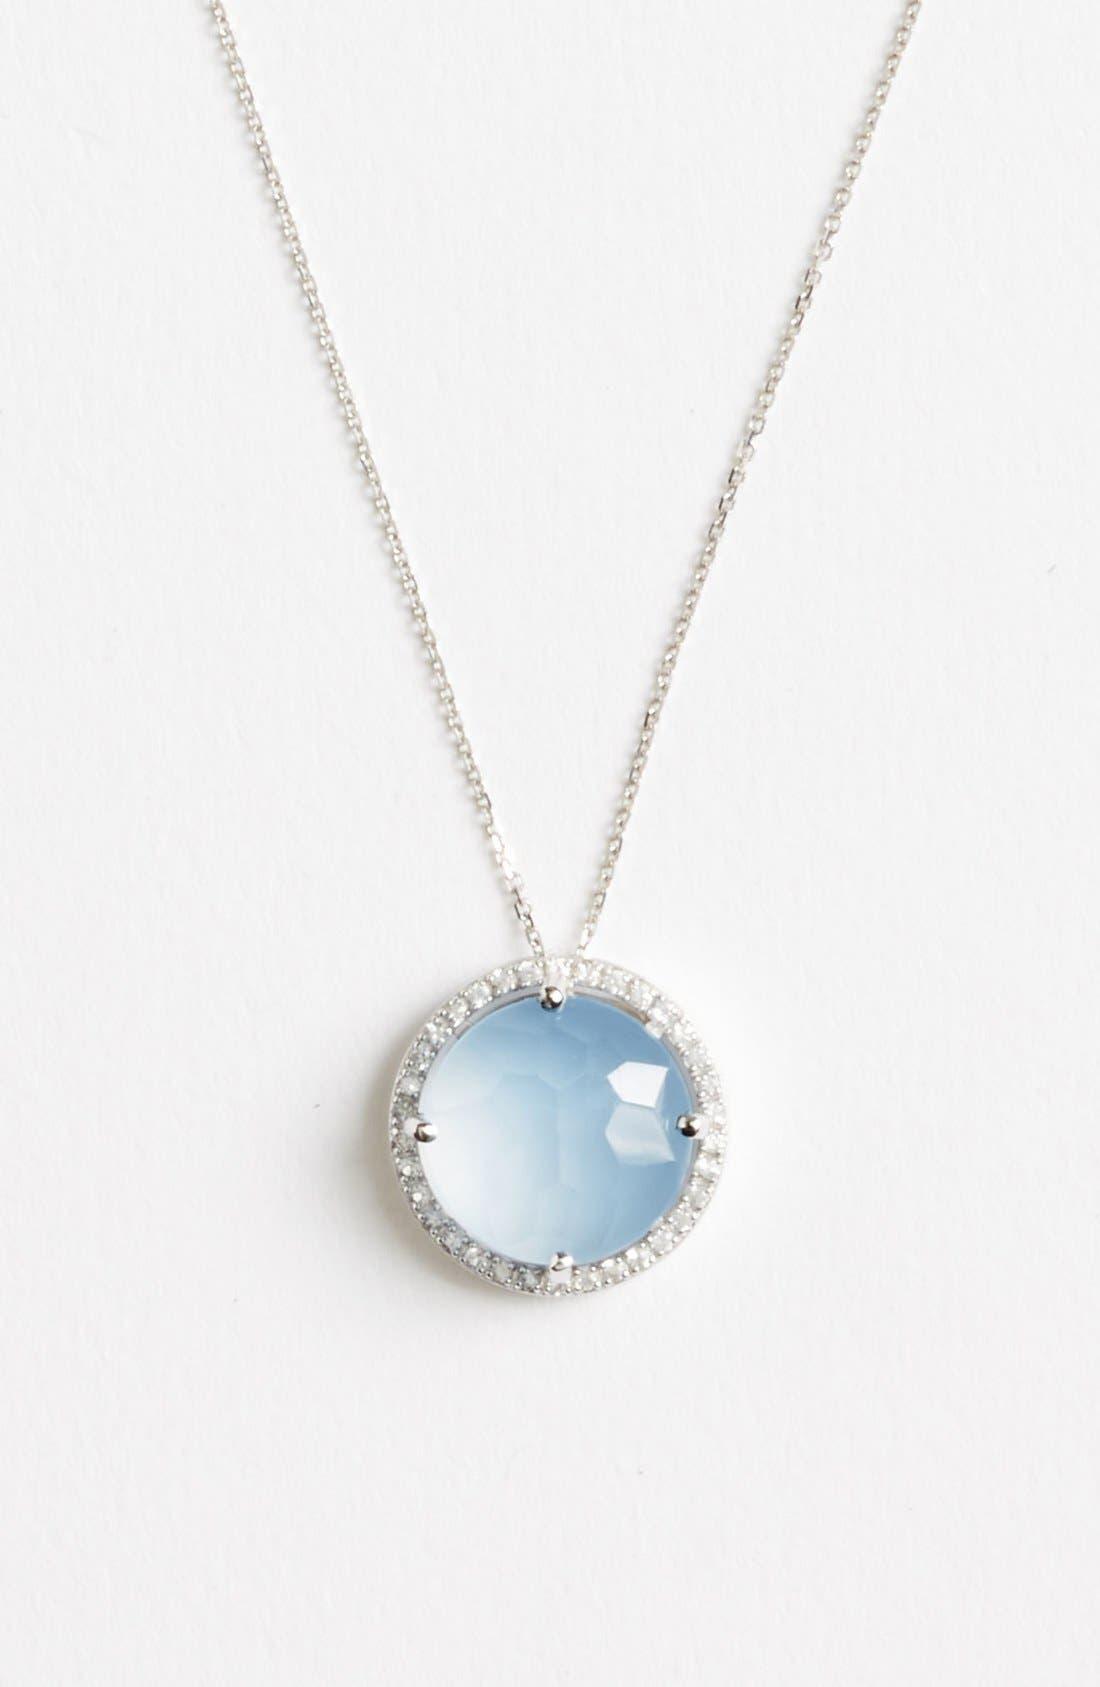 Alternate Image 1 Selected - KALAN by Suzanne Kalan Stone & Sapphire Pendant Necklace